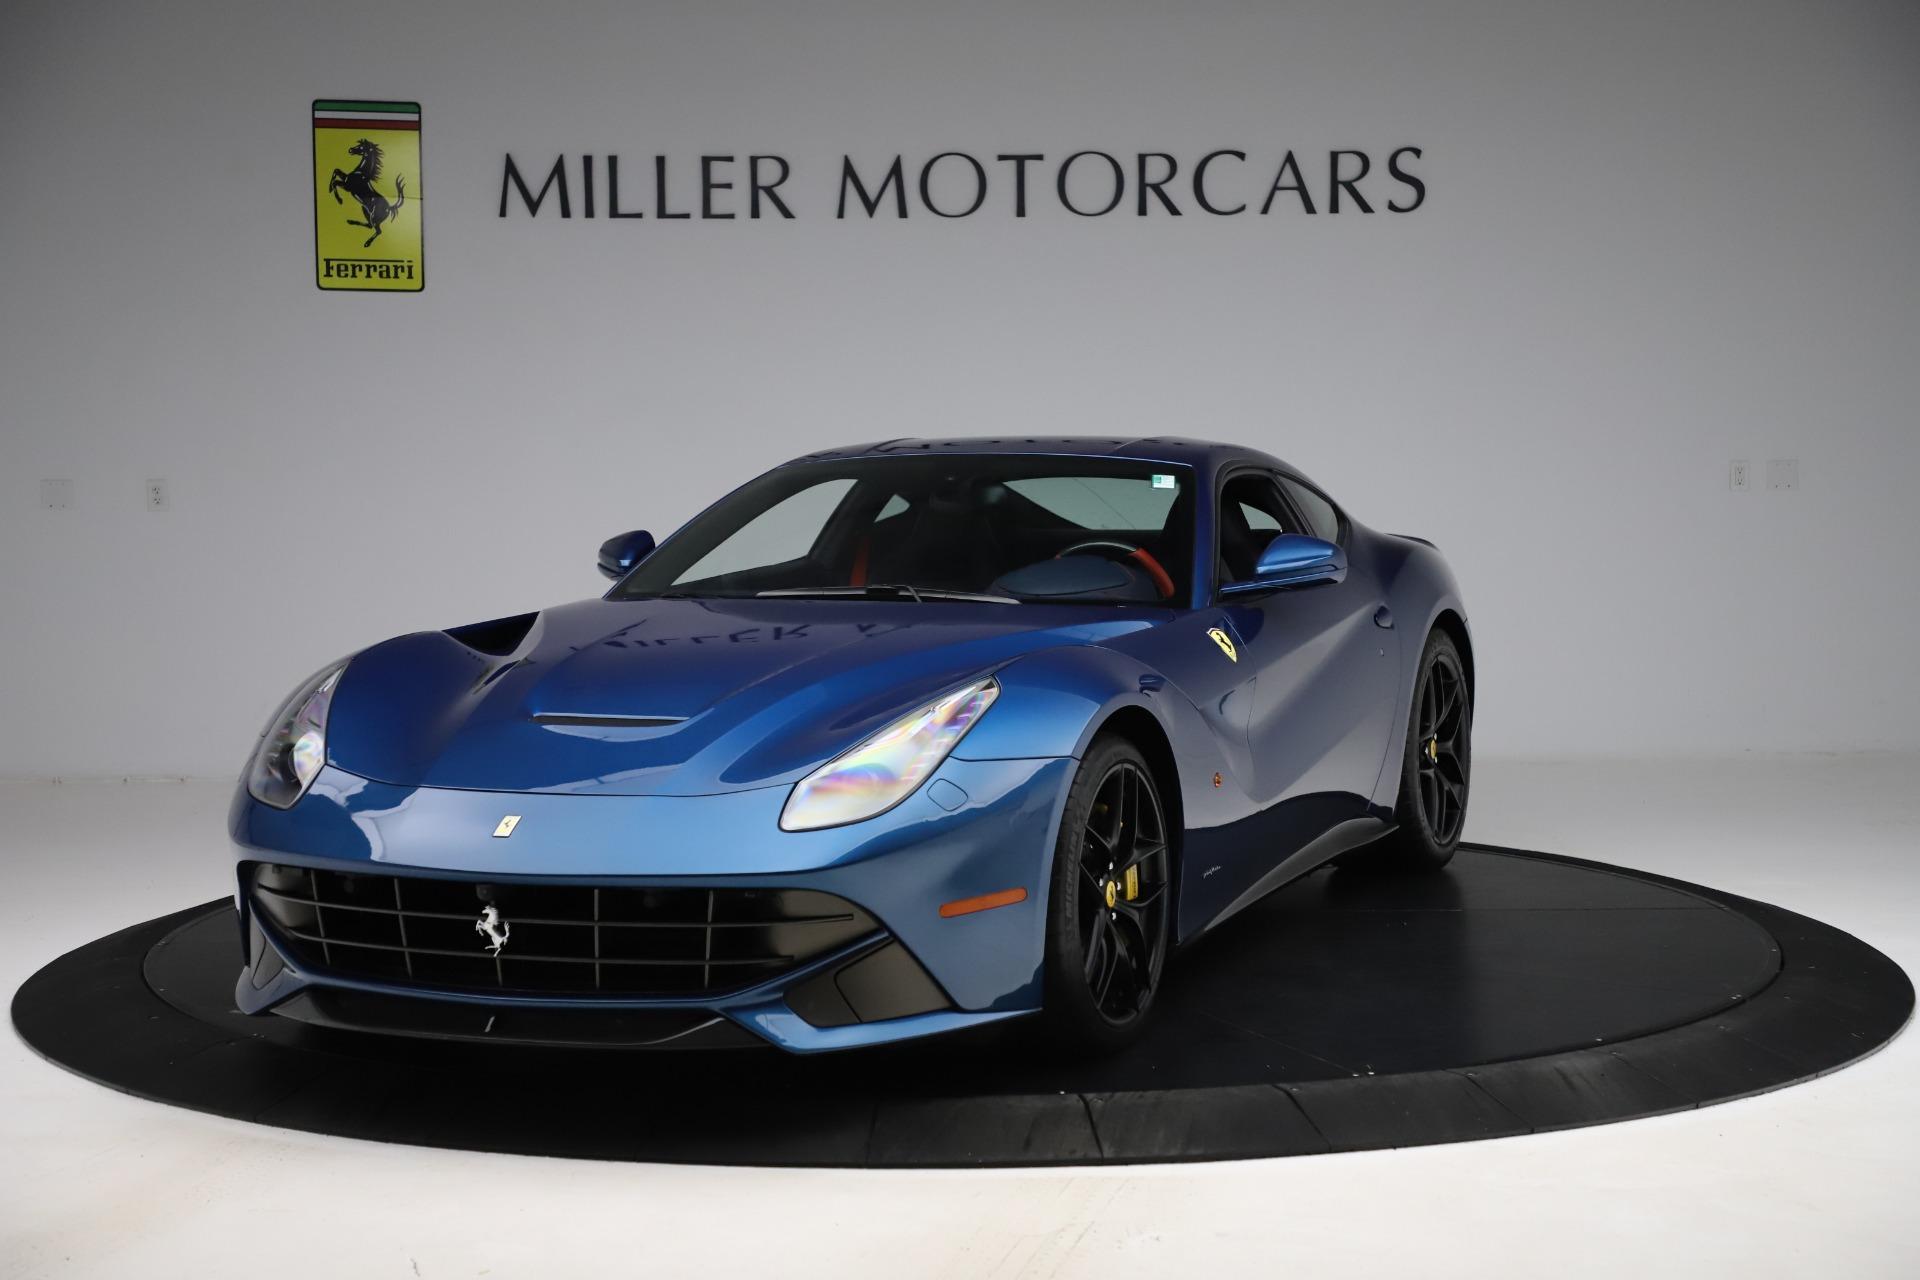 Used 2015 Ferrari F12 Berlinetta for sale $229,900 at Pagani of Greenwich in Greenwich CT 06830 1